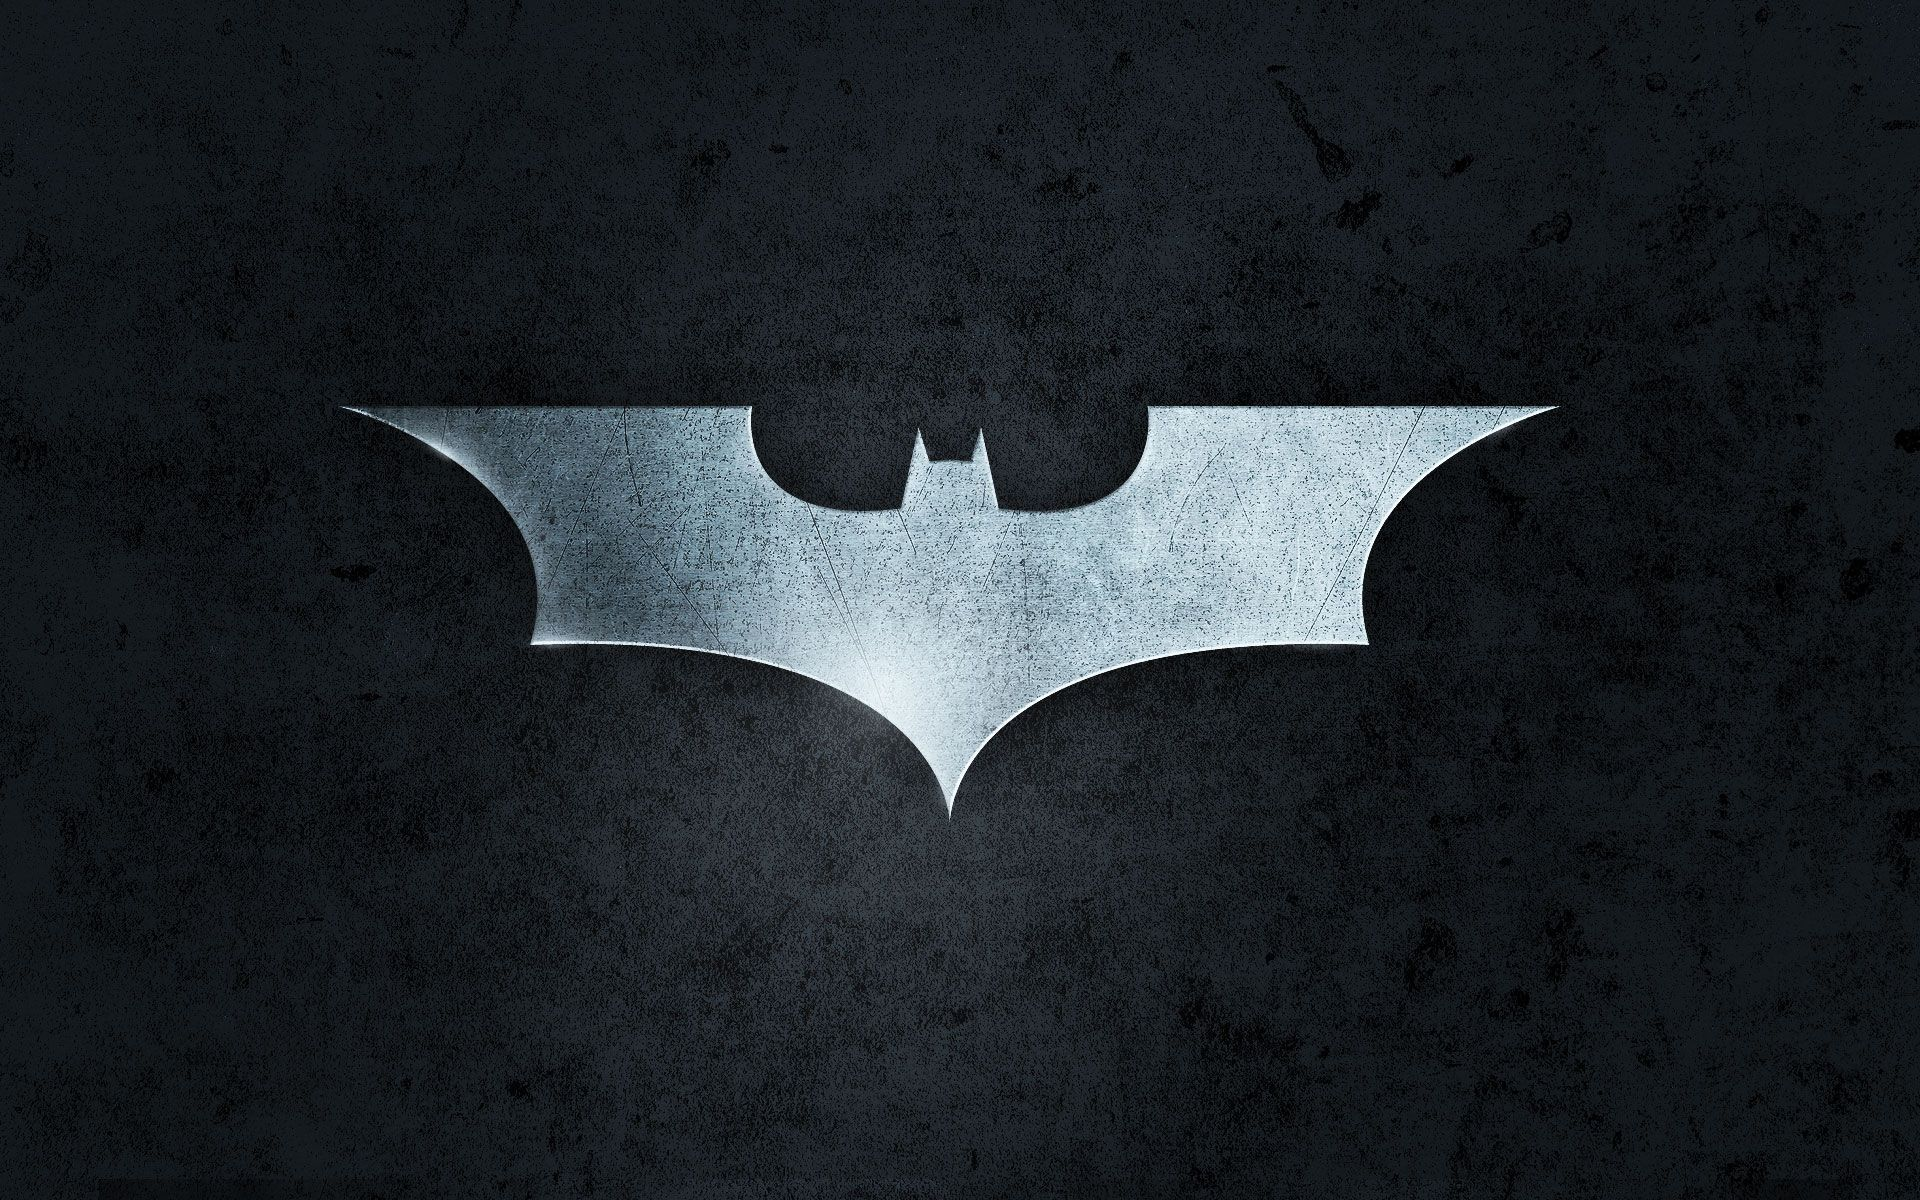 Batman Logo Wallpapers Top Free Batman Logo Backgrounds